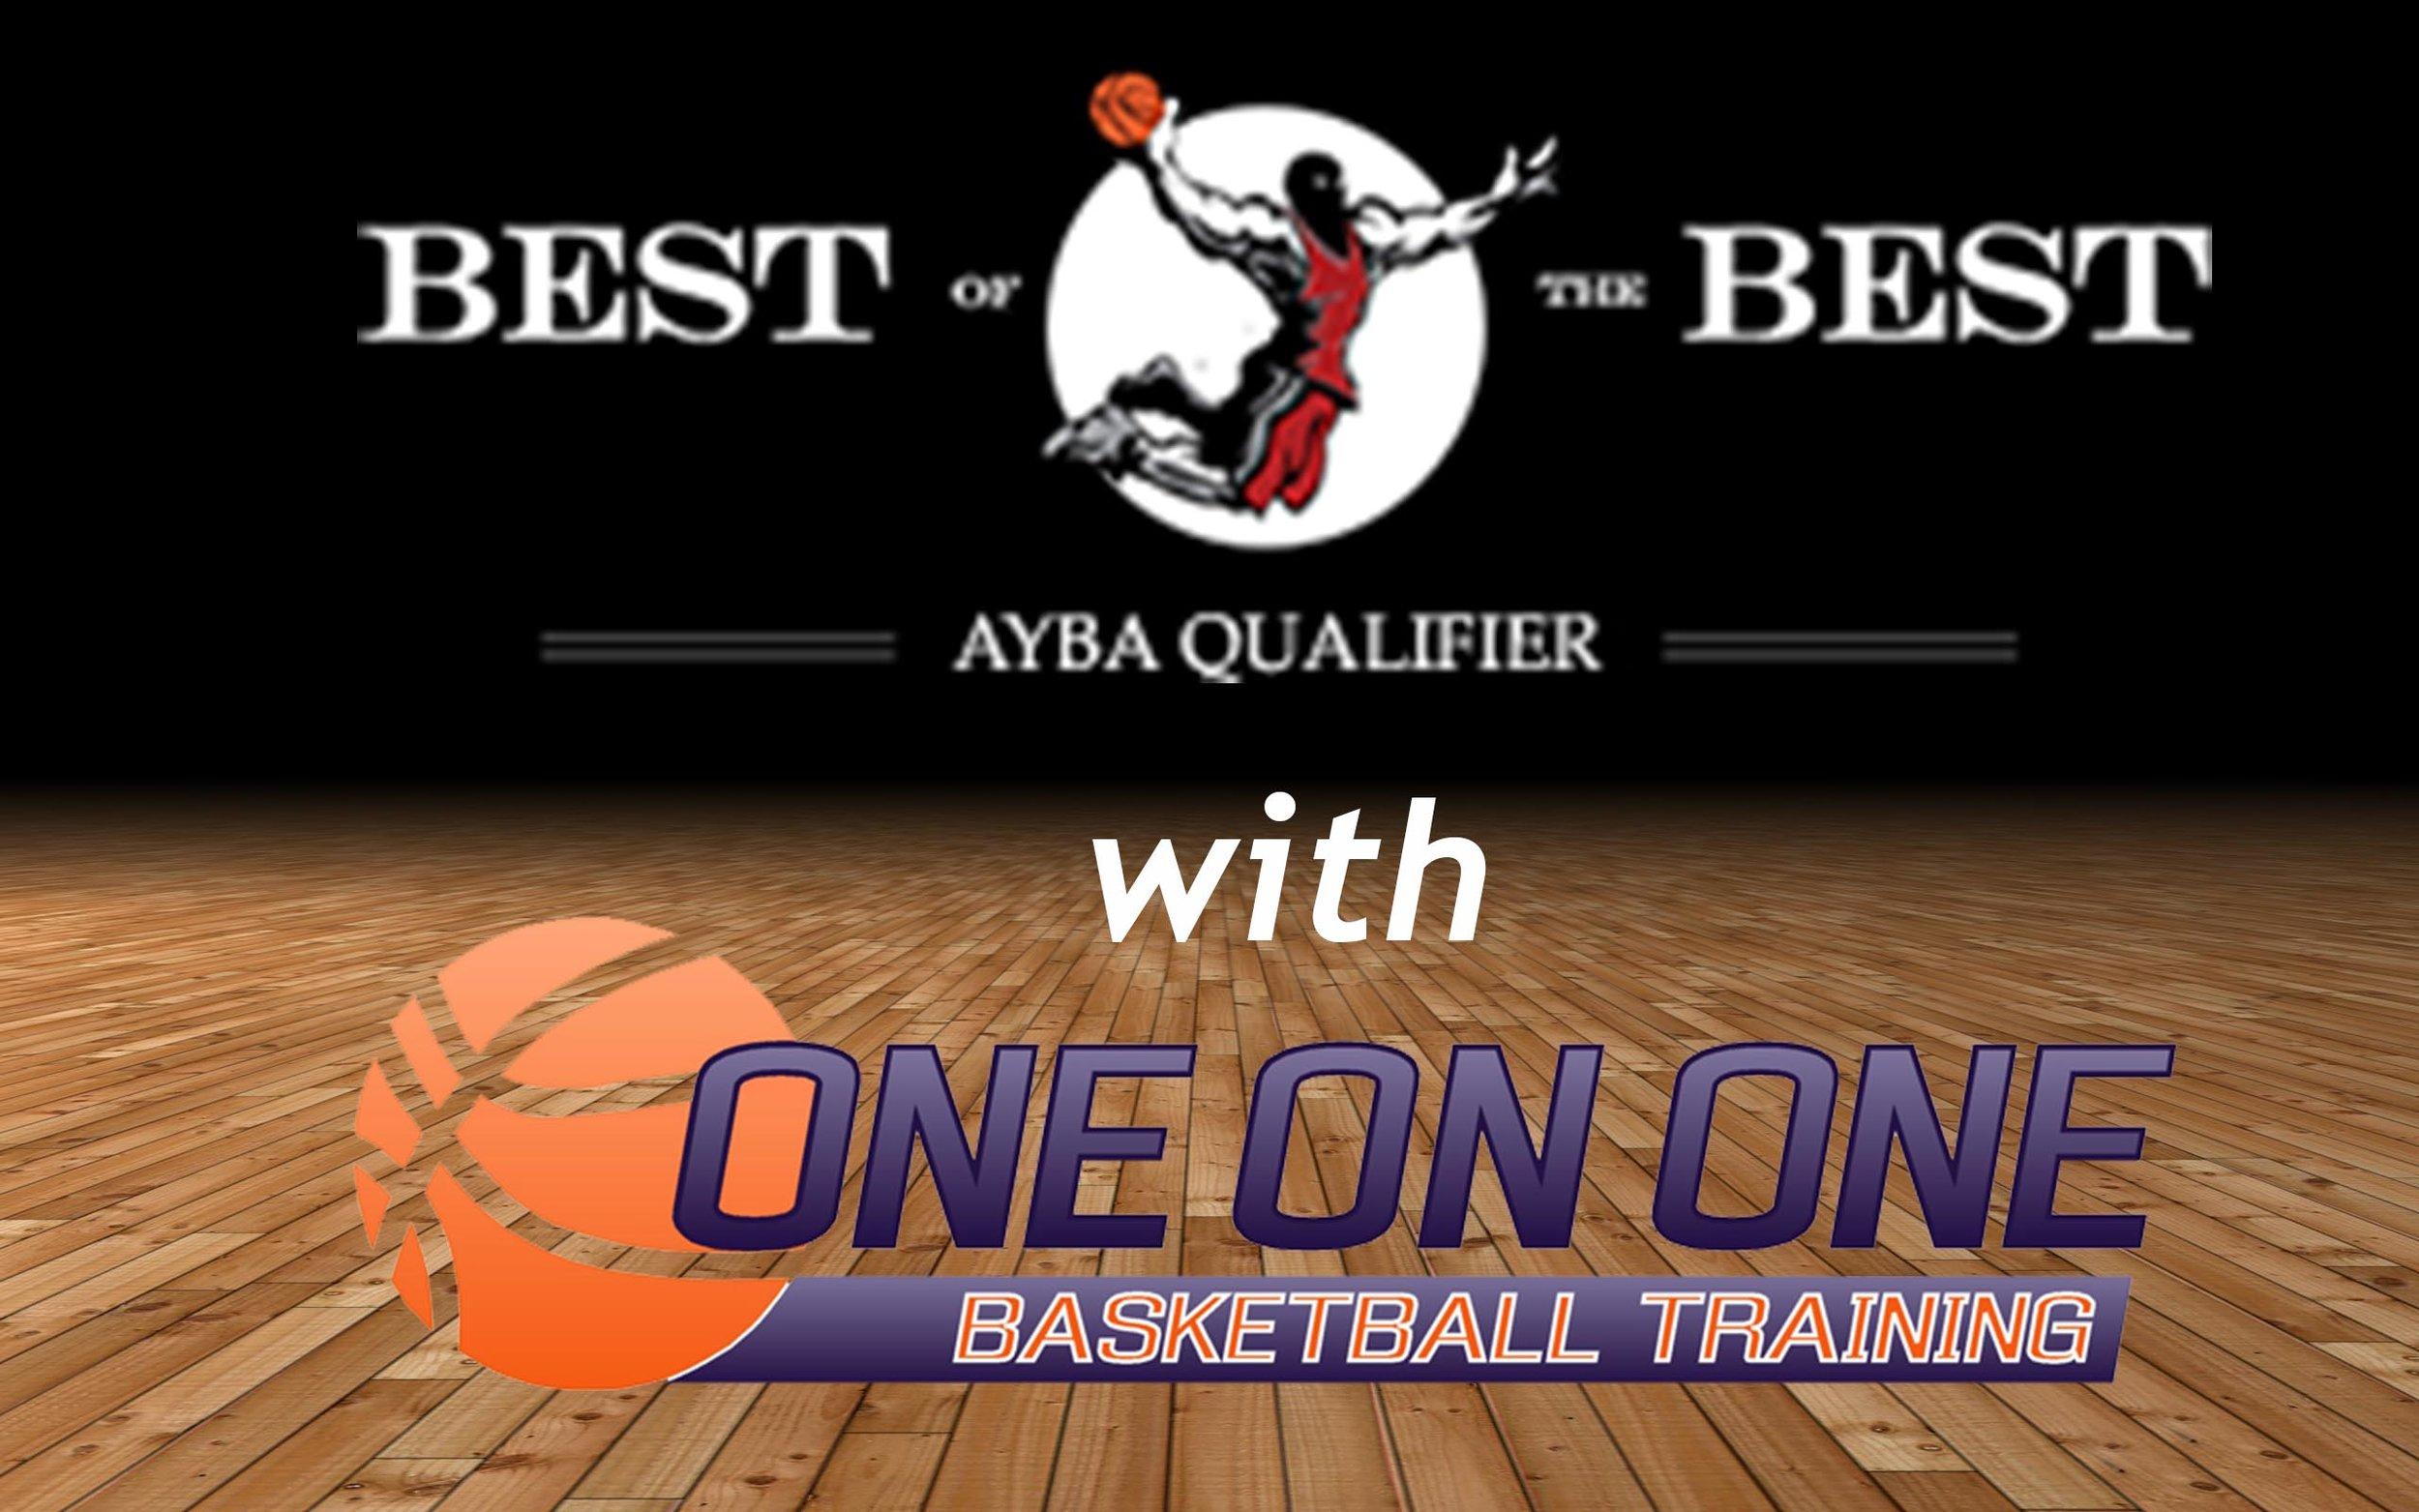 Best_Basketball_One_on_One.jpg